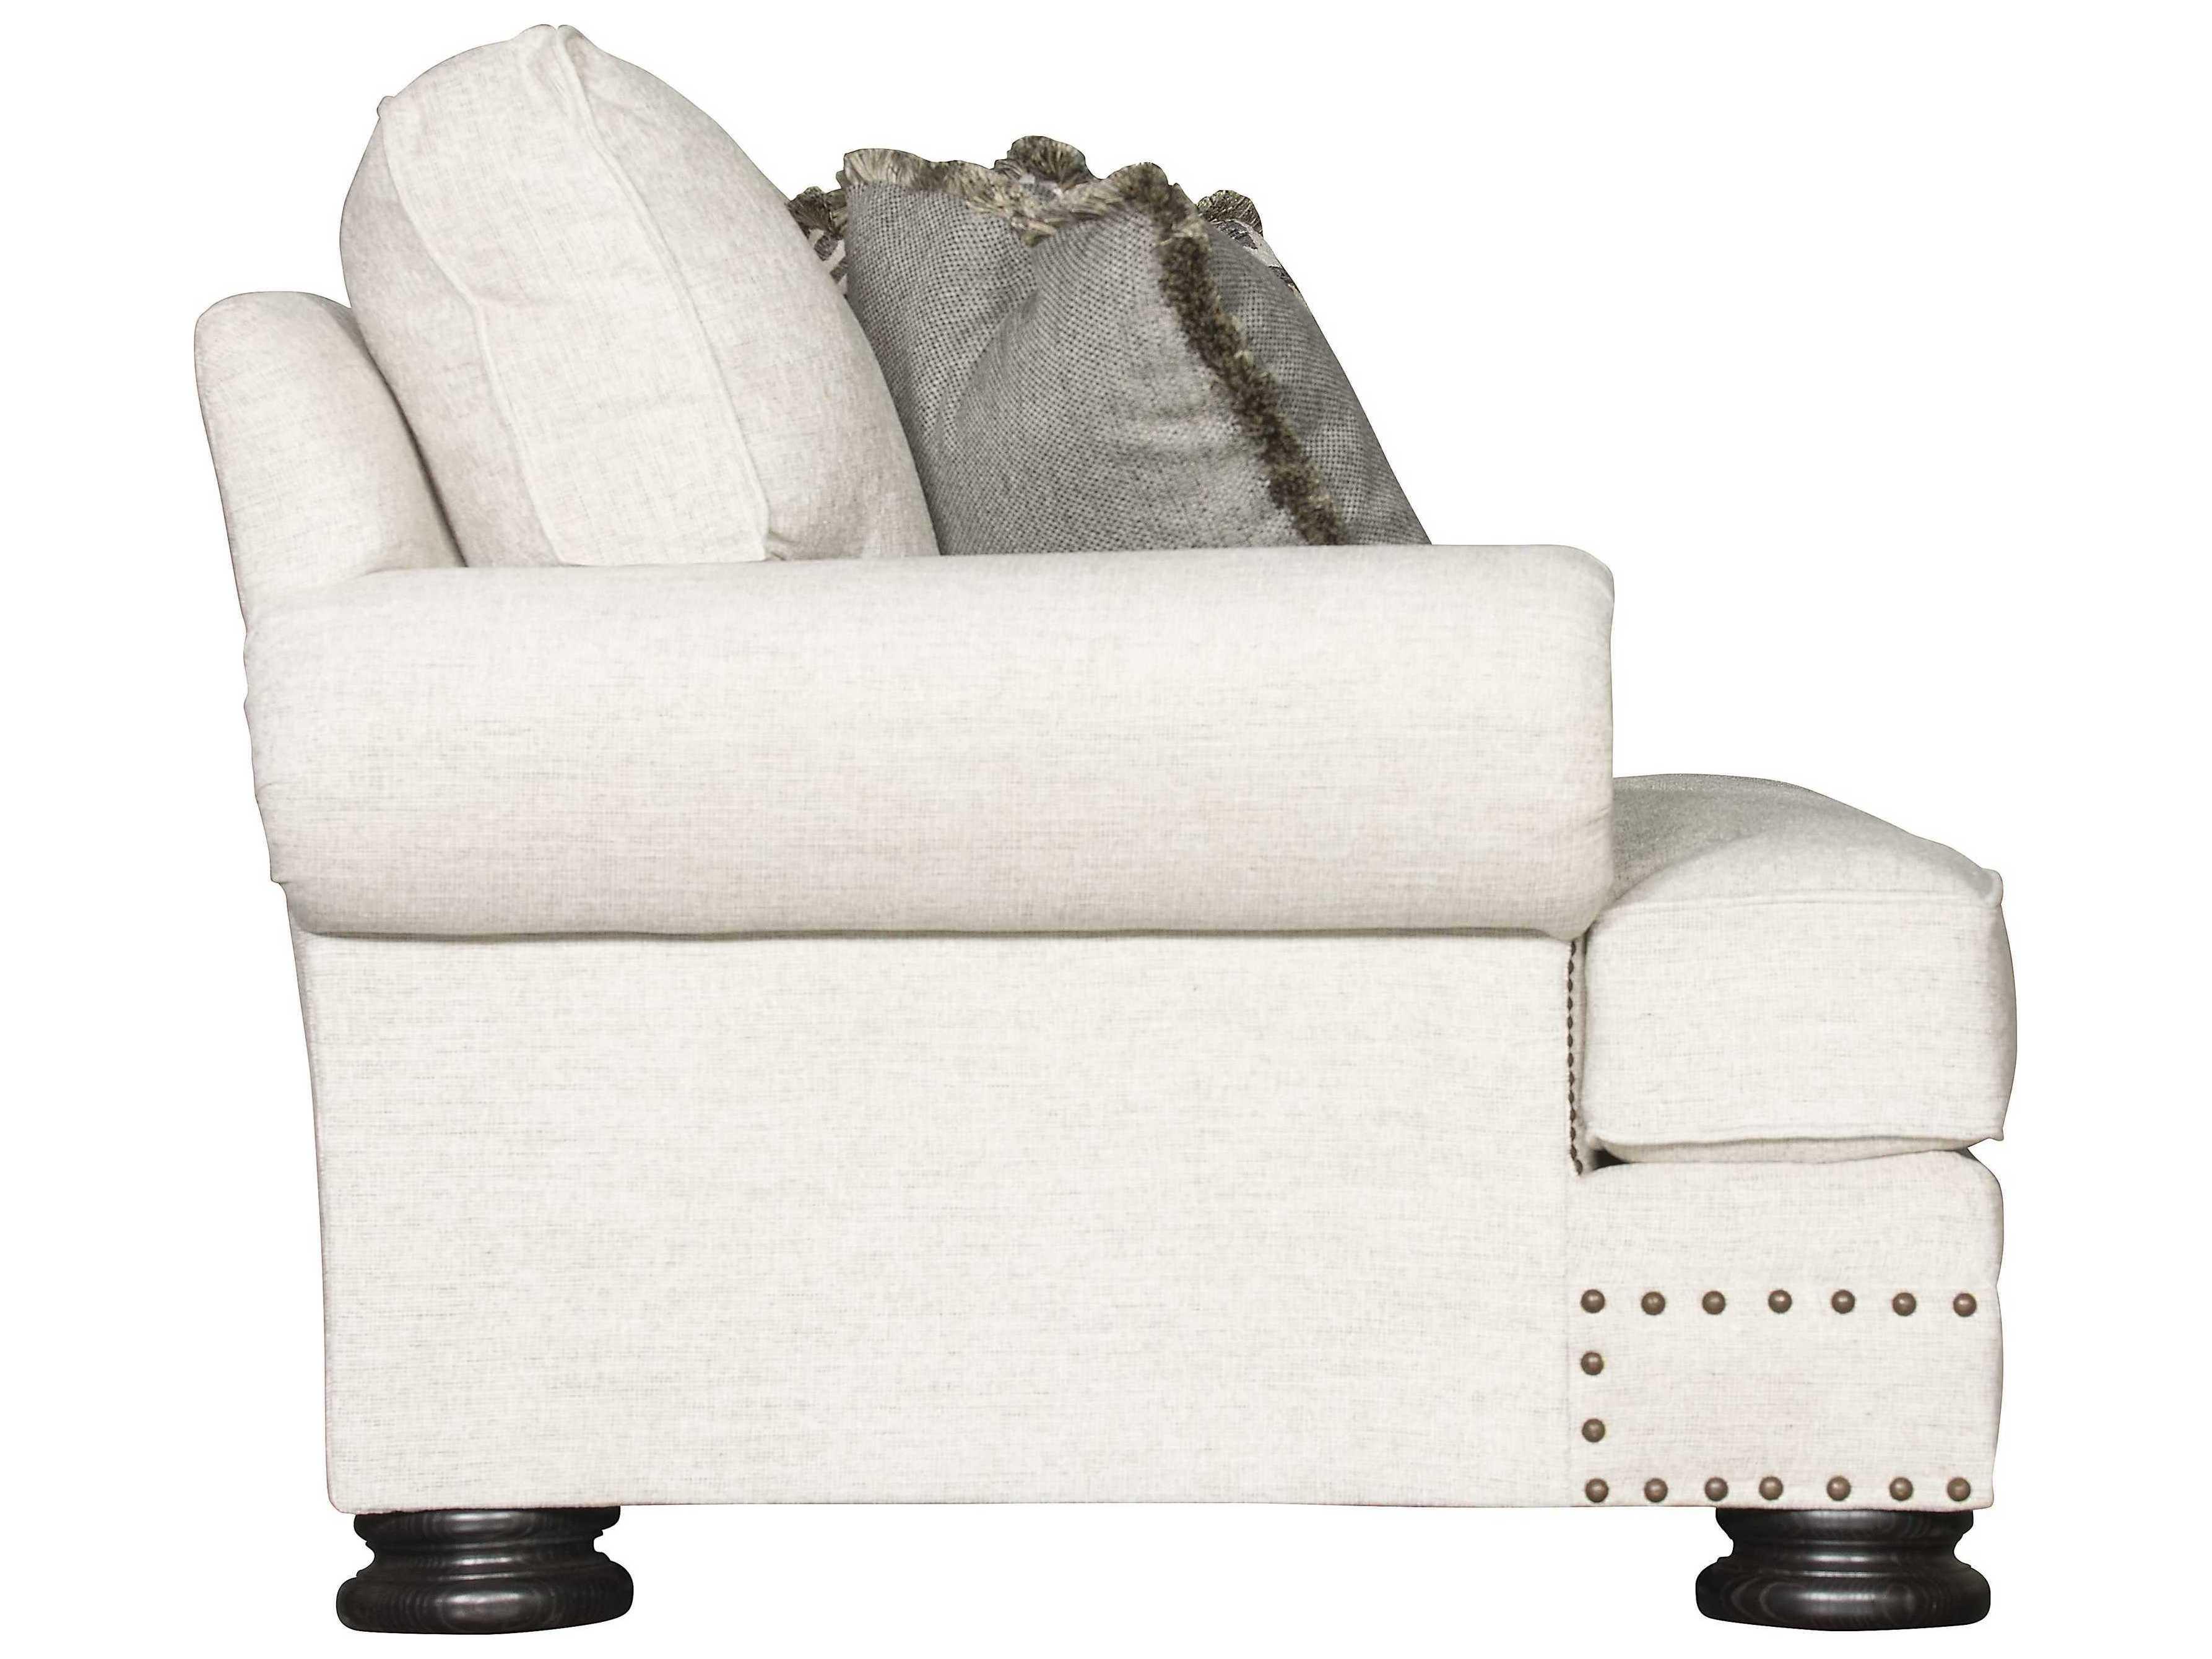 Bernhardt Foster Mocha Sofa Couch | BHB5177G